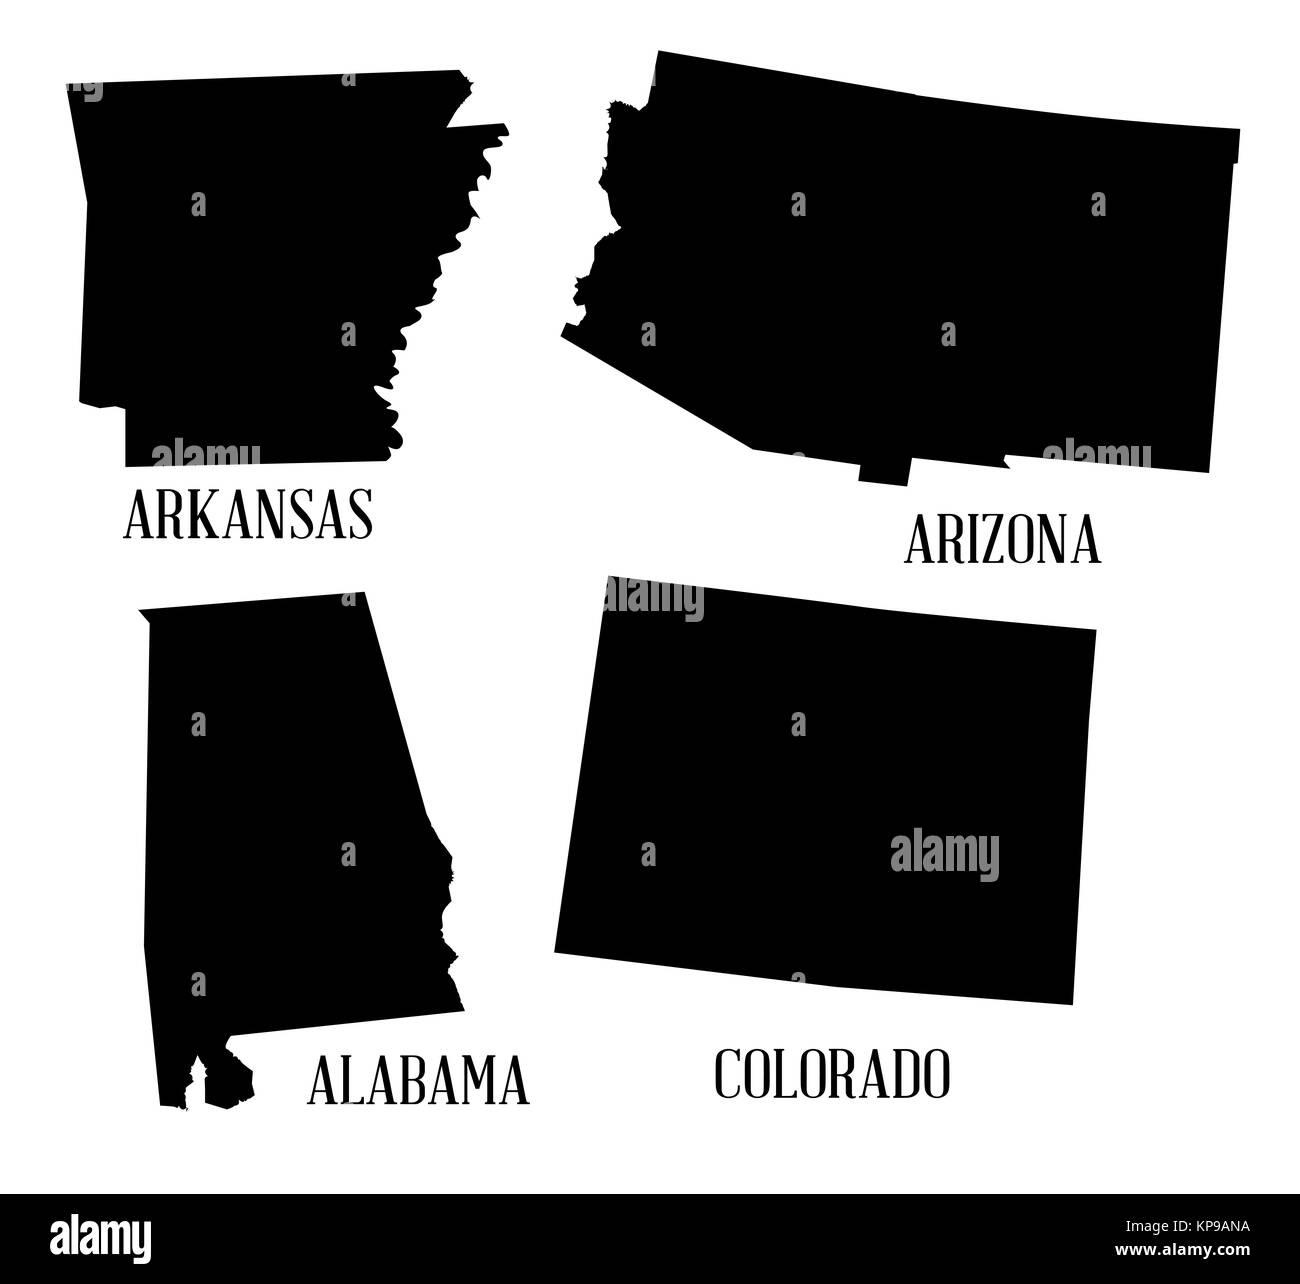 Colorado Map Outline Black And White Stock Photos Images Alamy